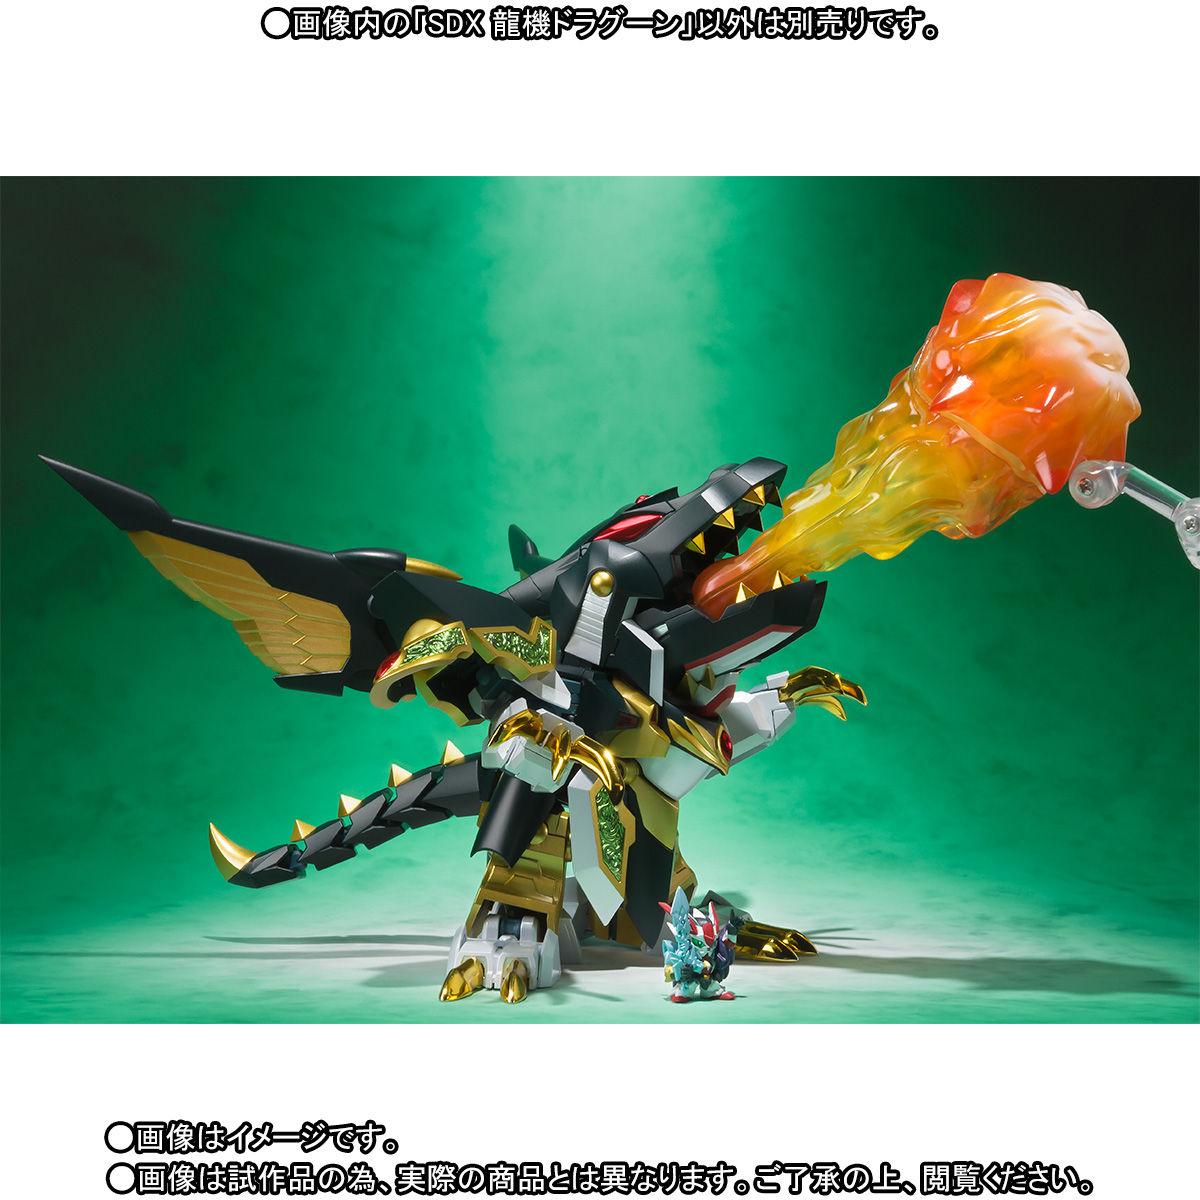 SDX『龍機ドラグーン|新SDガンダム外伝』可変可動フィギュア-009